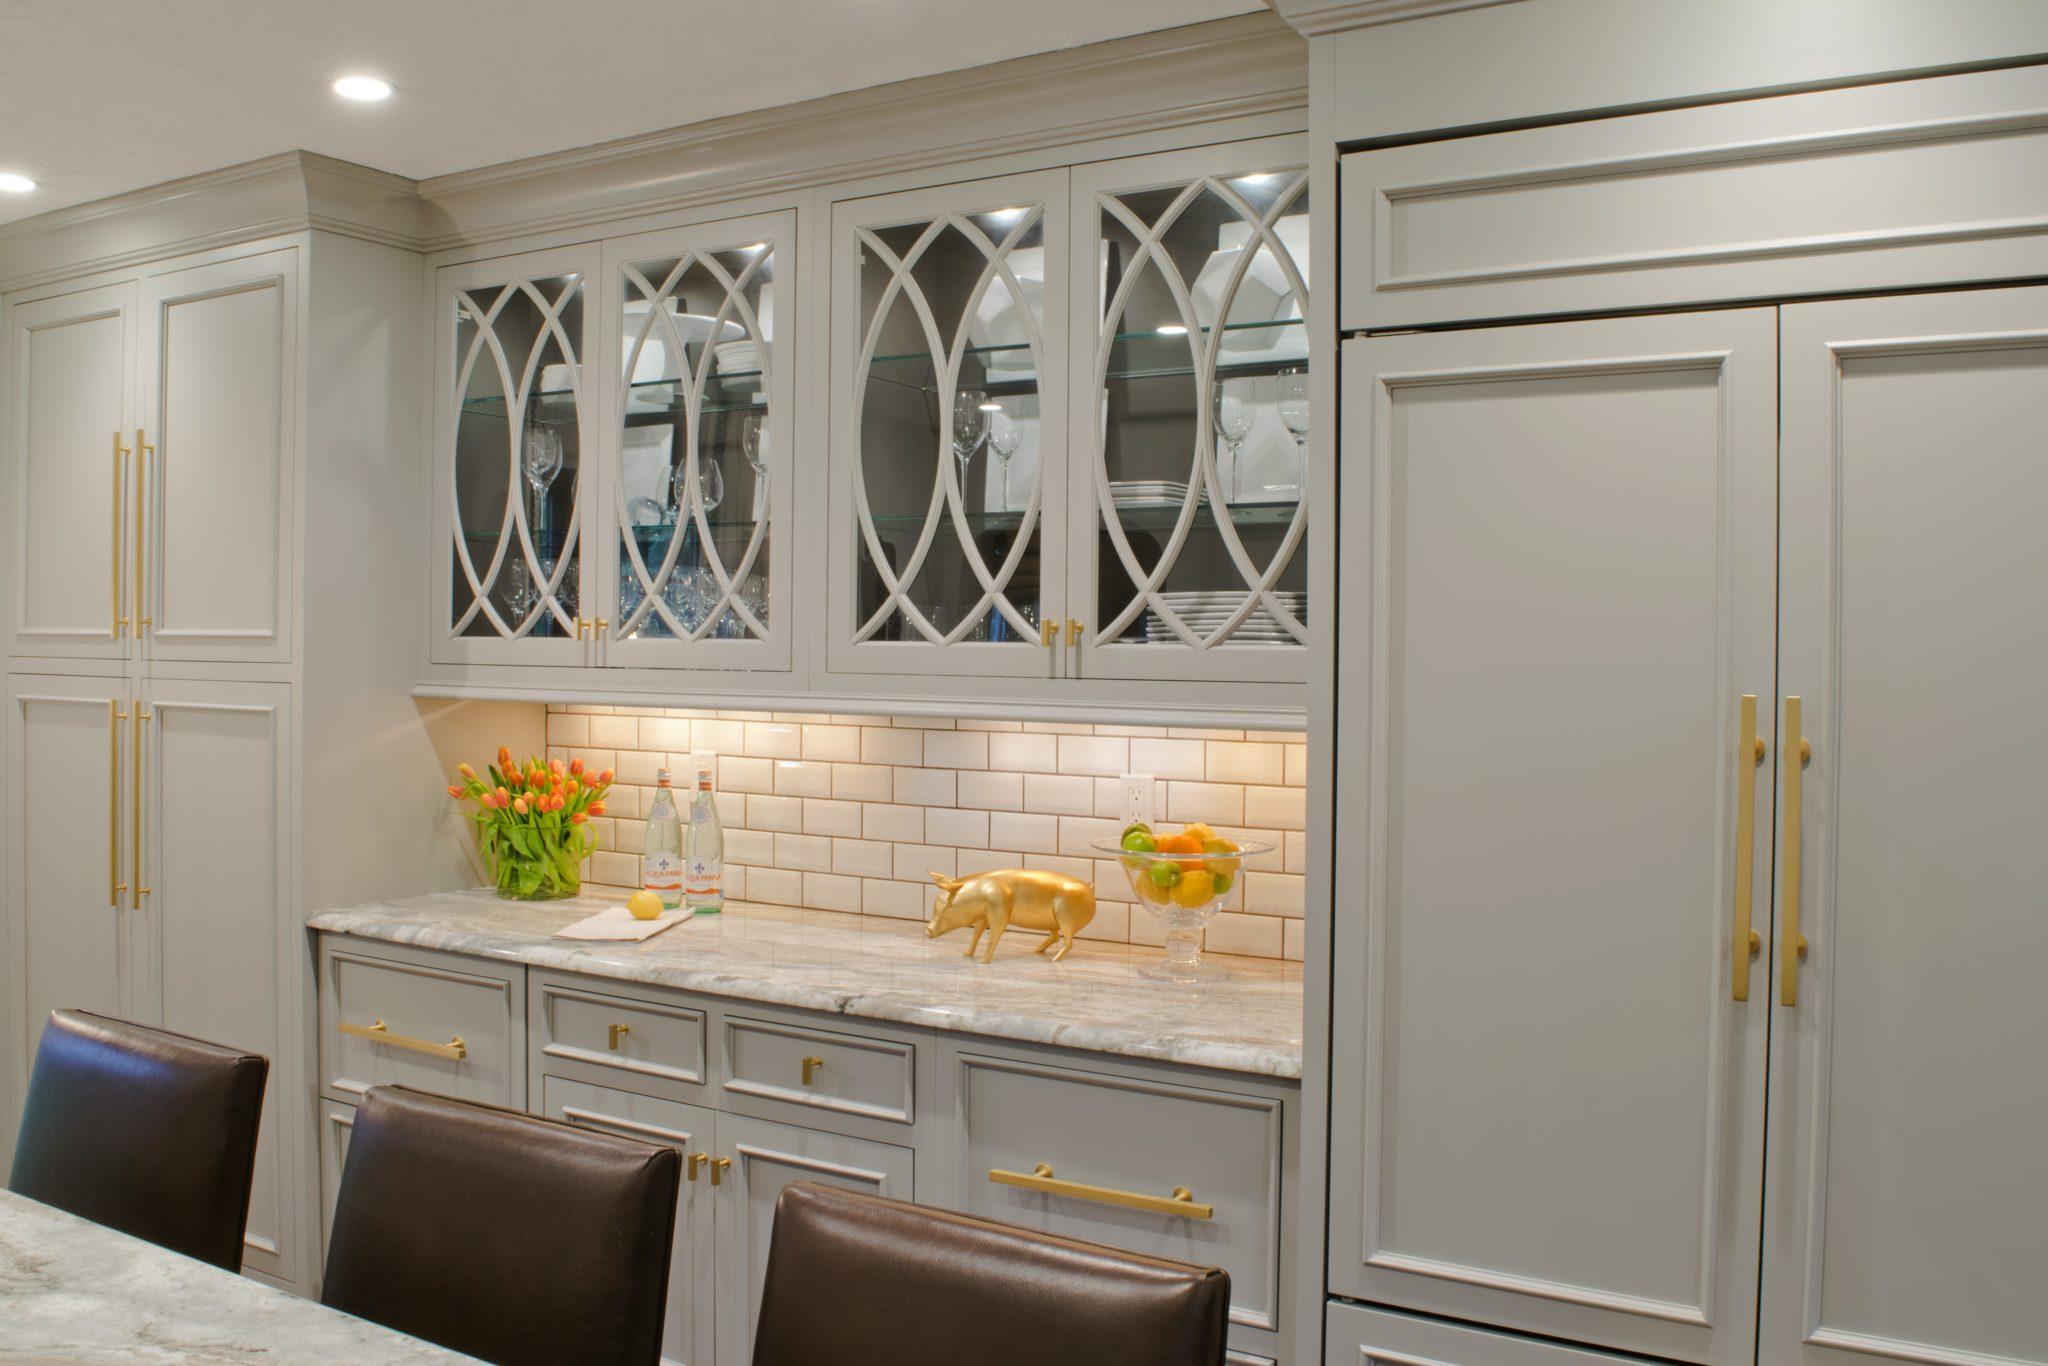 English Tudor kitchen renovation with custom cabinetry andTaj Mahal quartzite by LSM Interior Design